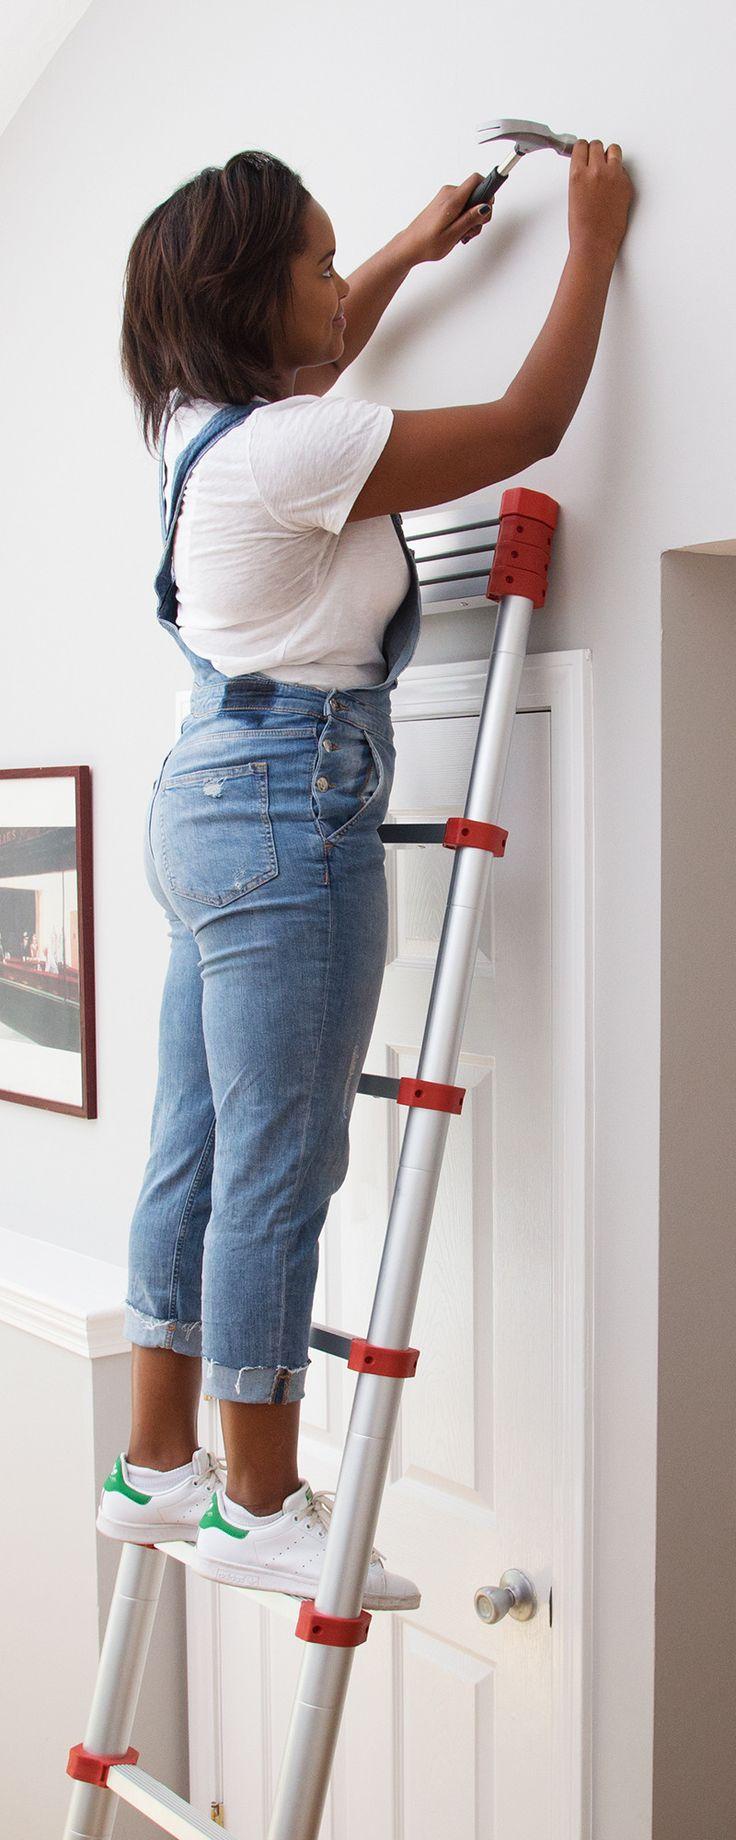 Xtend   Climb: Retractable Telescoping Ladders